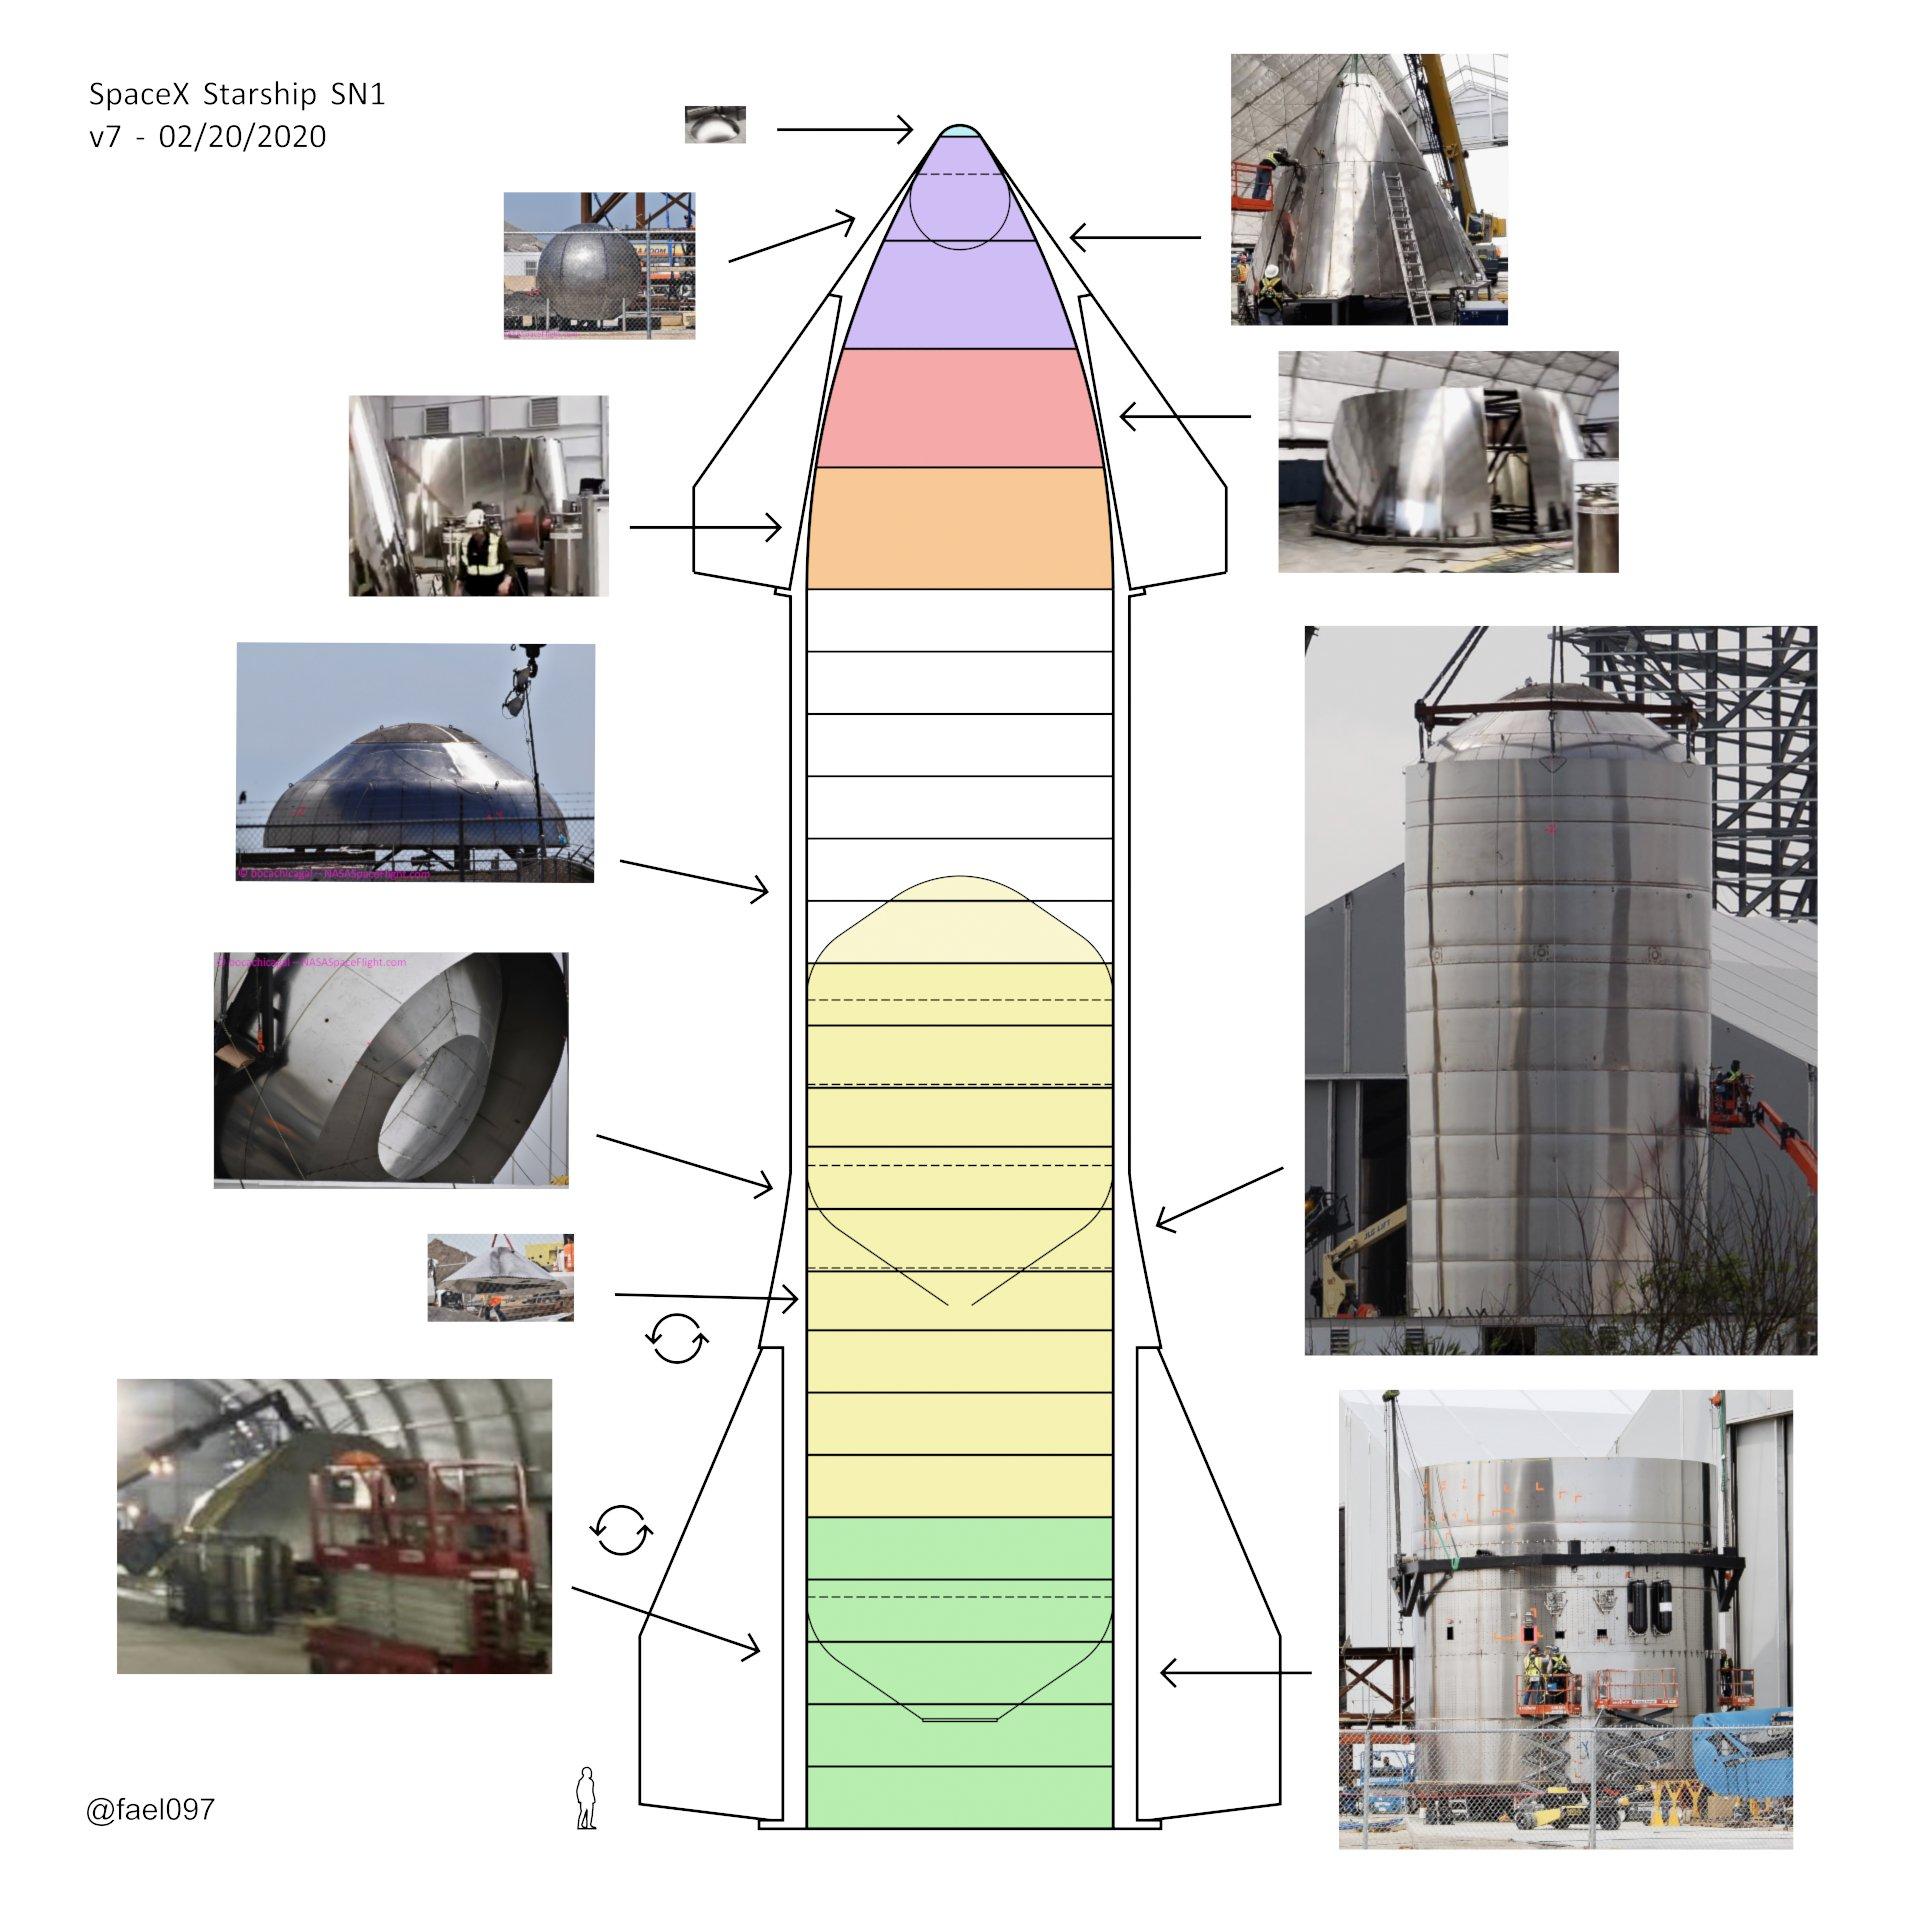 Starship SN1 (ex Mk3) (Boca Chica) - Page 10 EROgaloUUAIURrF?format=jpg&name=large